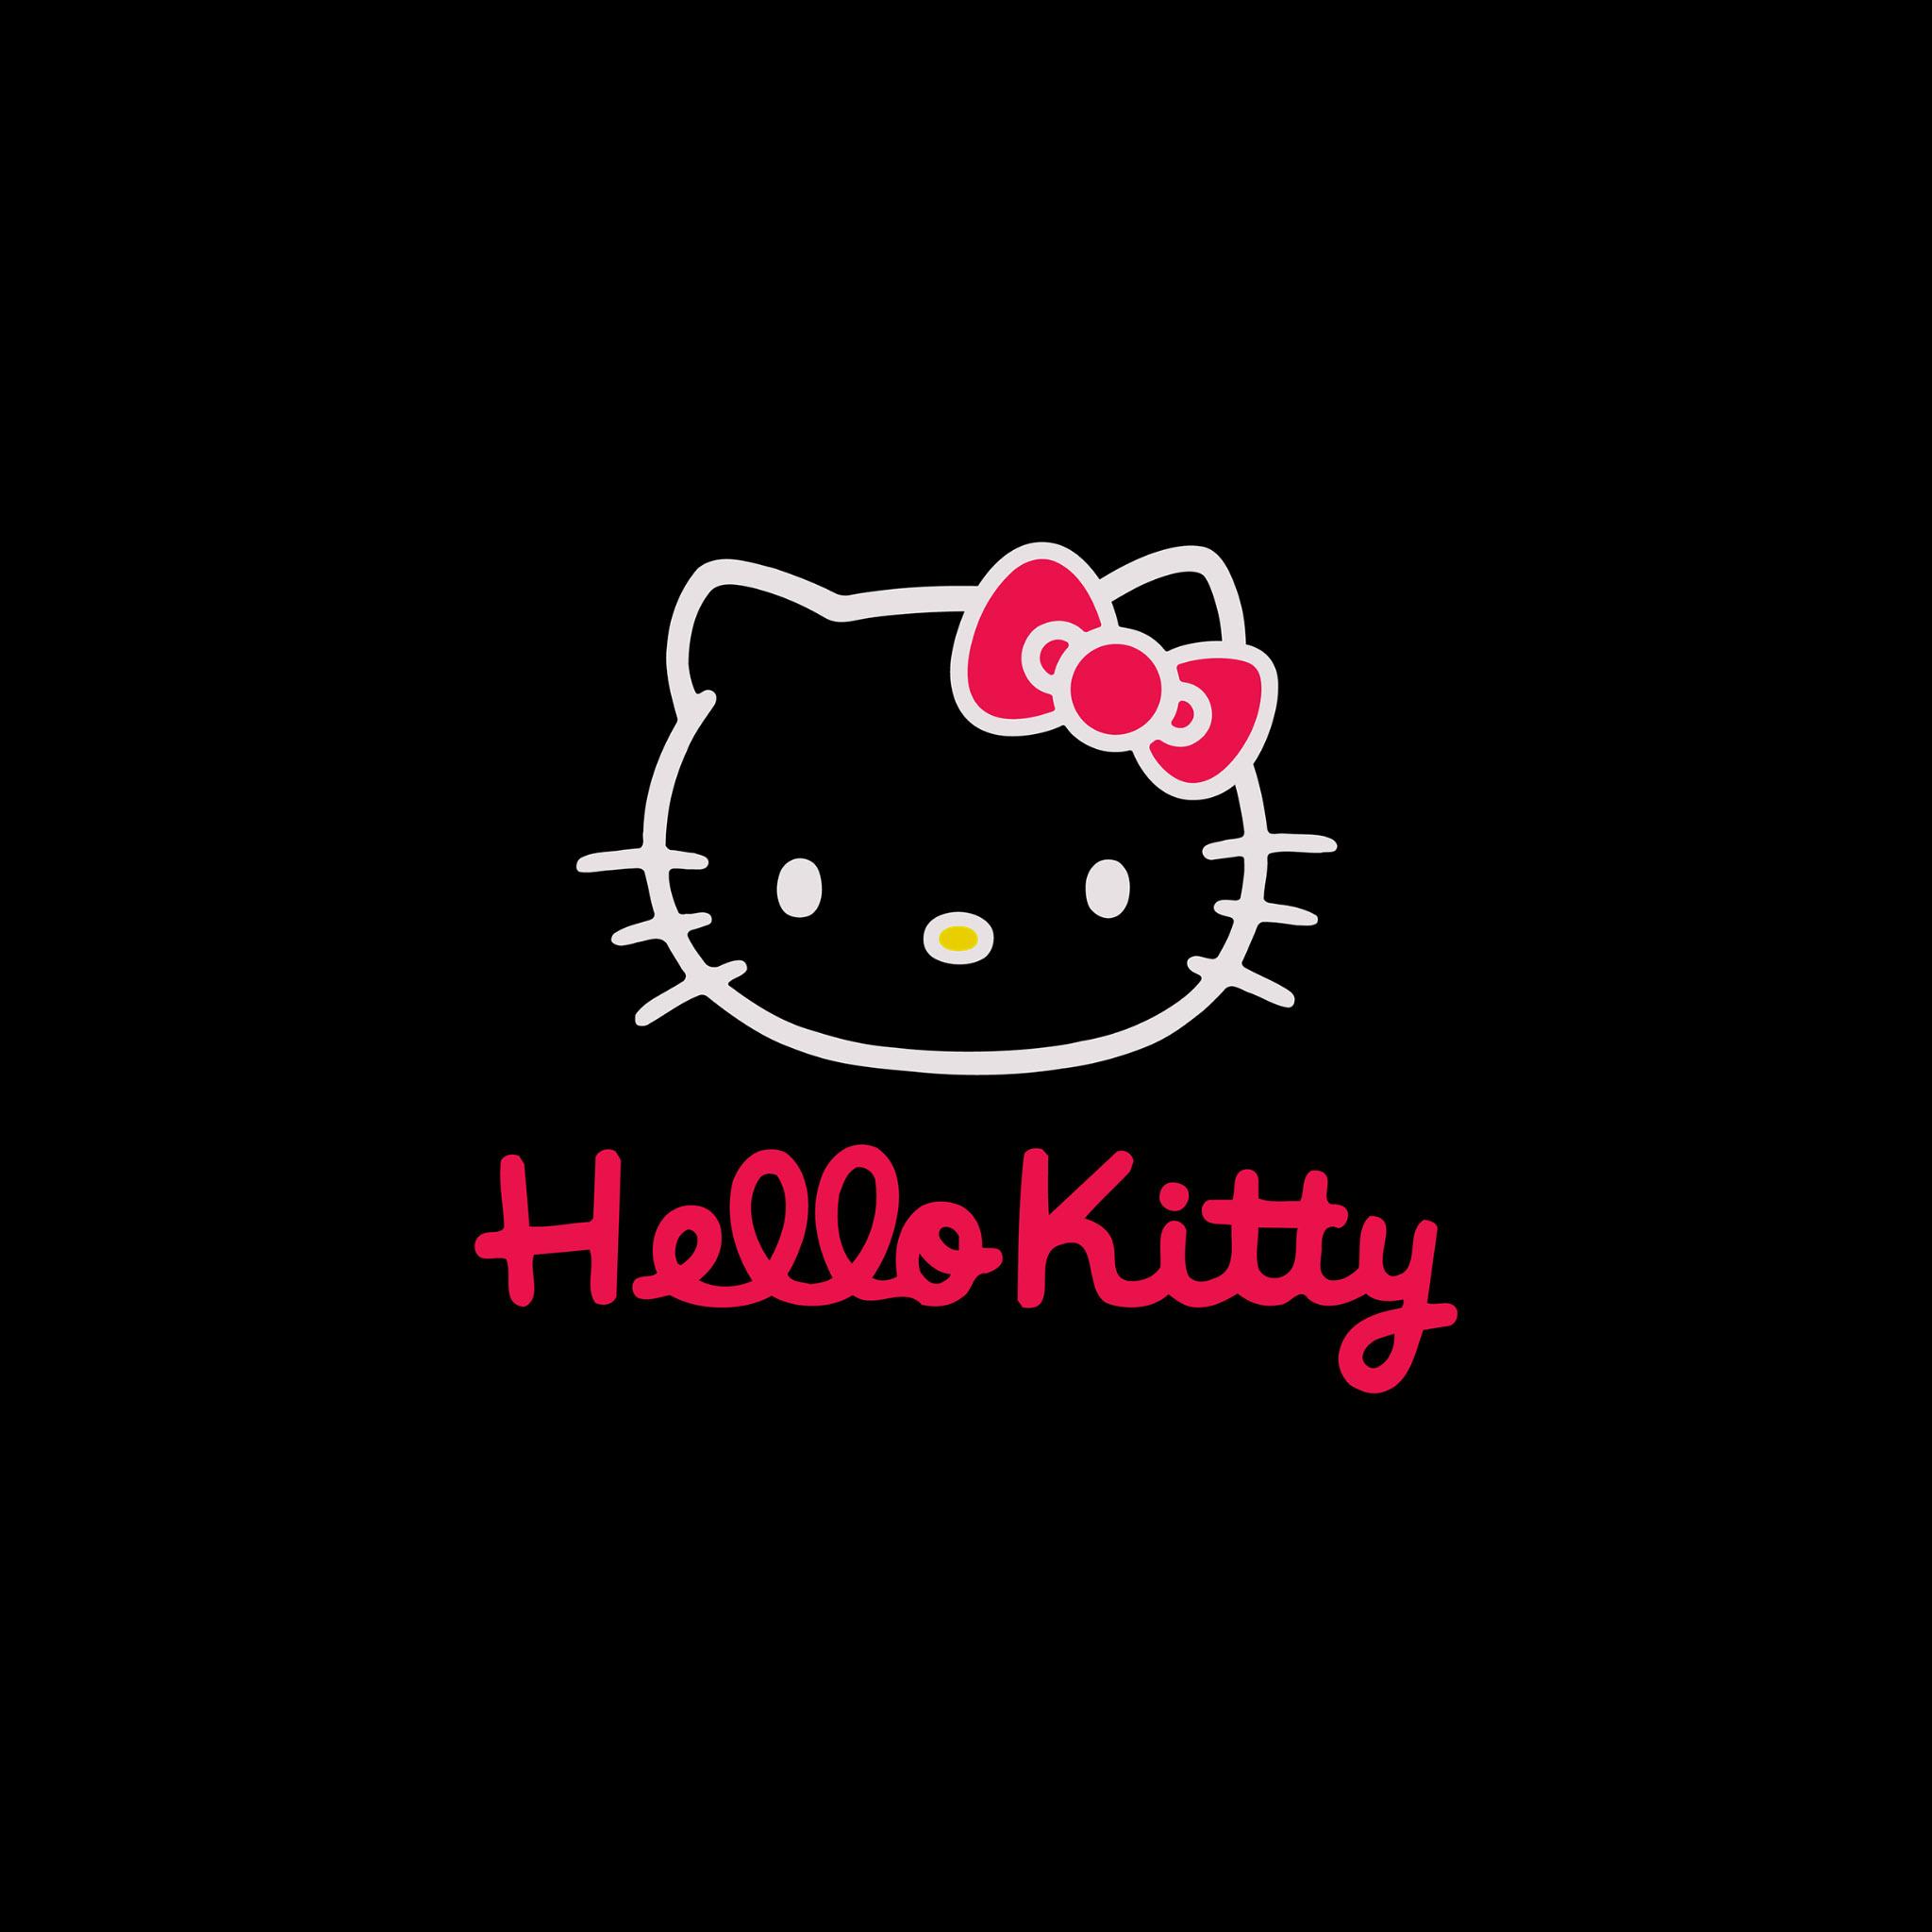 Good Wallpaper Hello Kitty Face - black-hello-kitty-wallpaper-13  Snapshot_988799.jpg